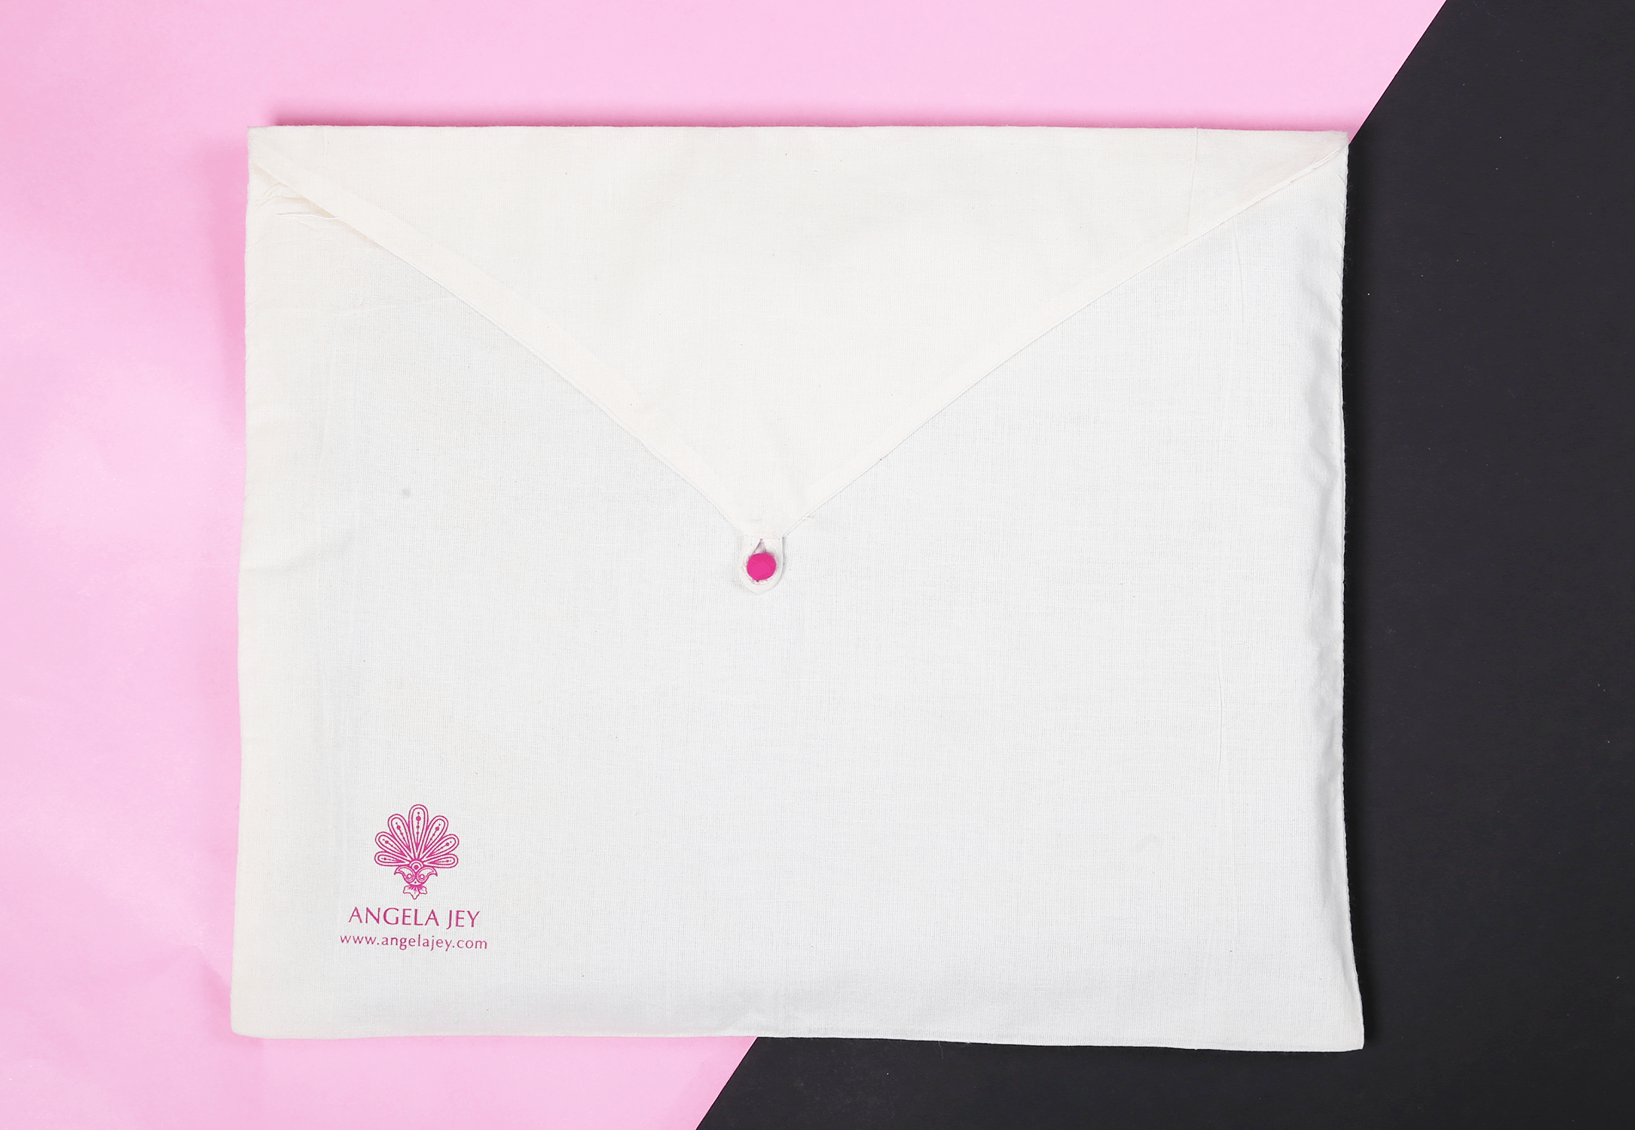 Pashmina shawl packing - tips to care your pashmina